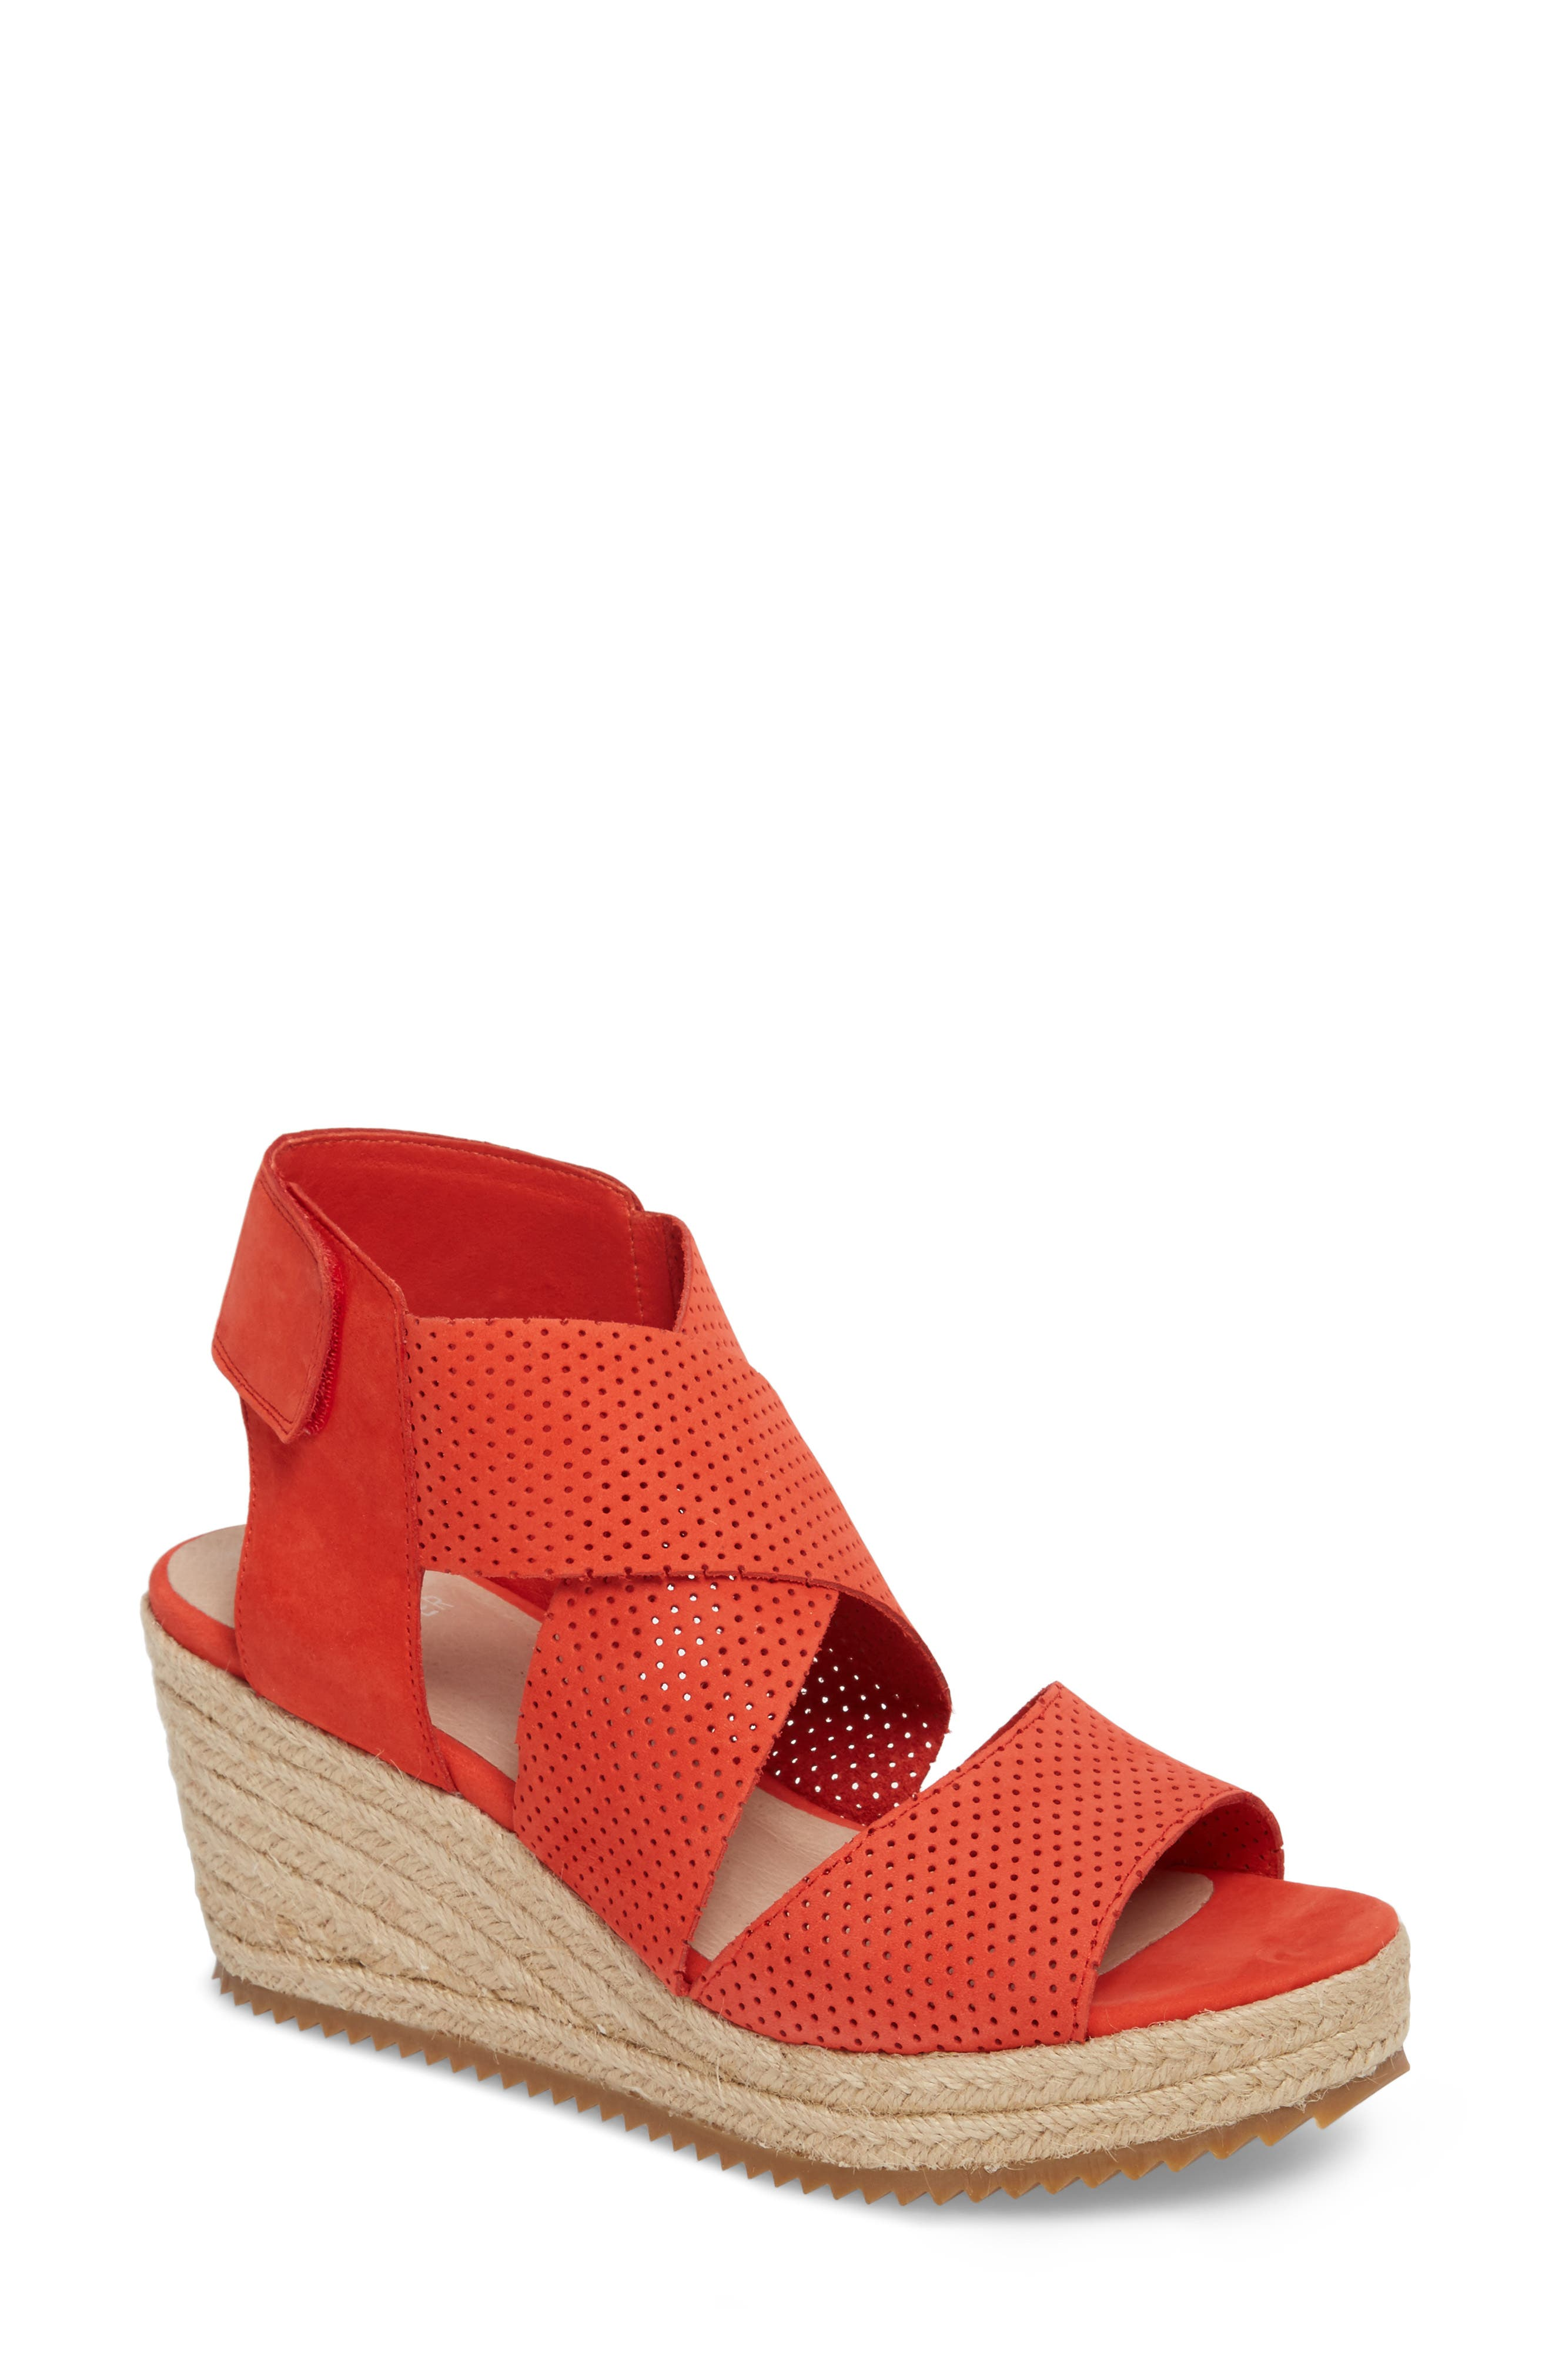 'Willow' Espadrille Wedge Sandal,                         Main,                         color, PERSIMMON NUBUCK